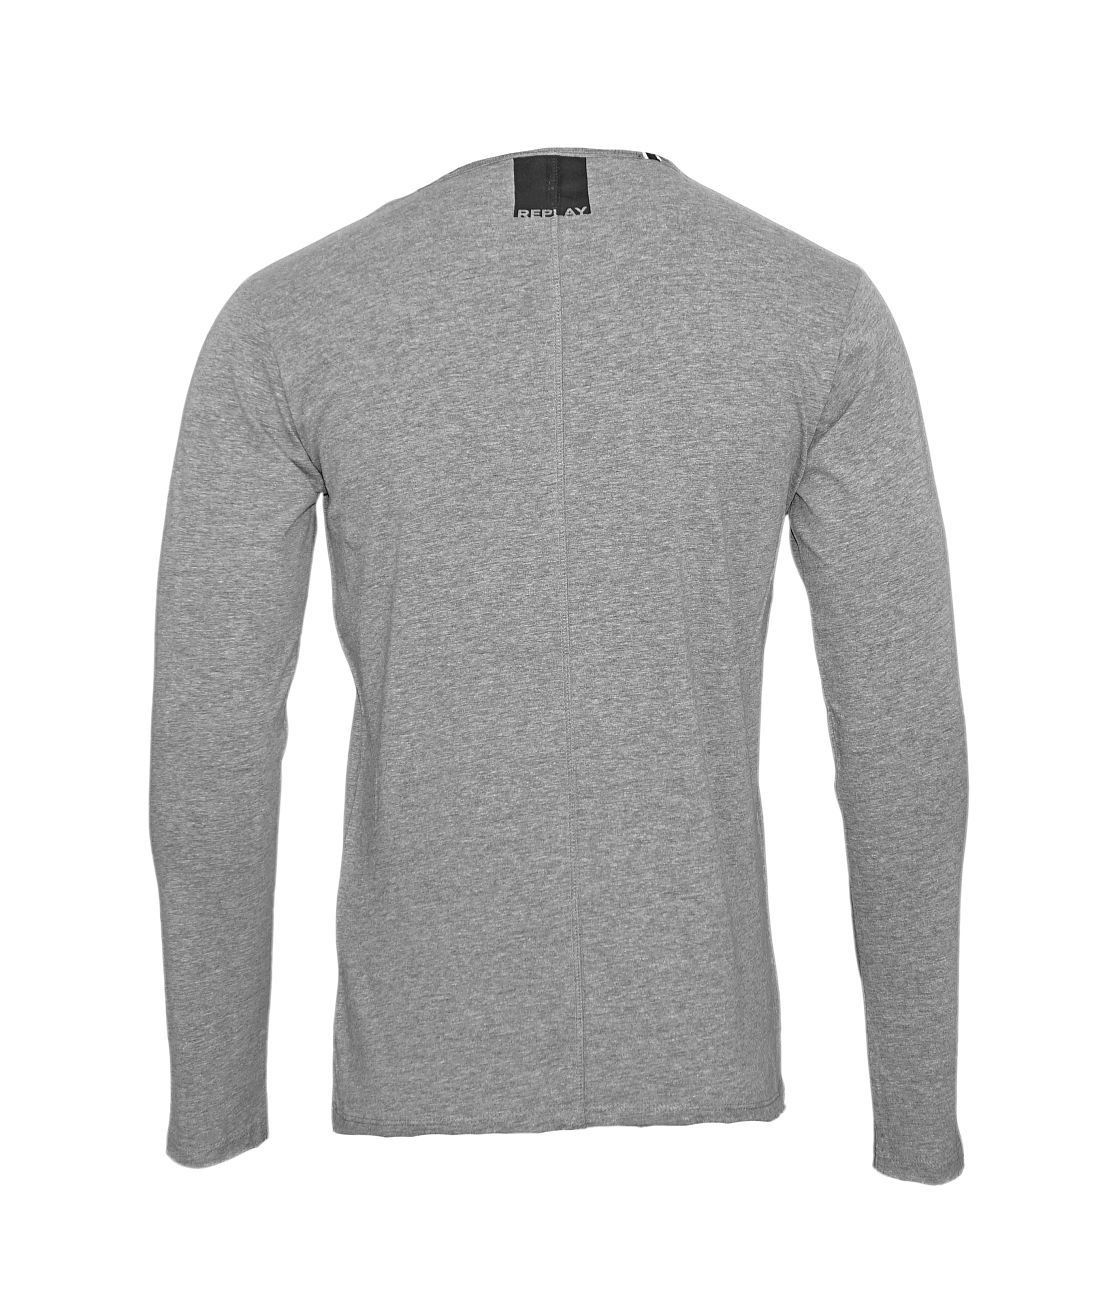 Replay Longsleeve Shirt Rundhals M3592.000 2660.M03 DARK GREY MELANGE S18-RPLS1